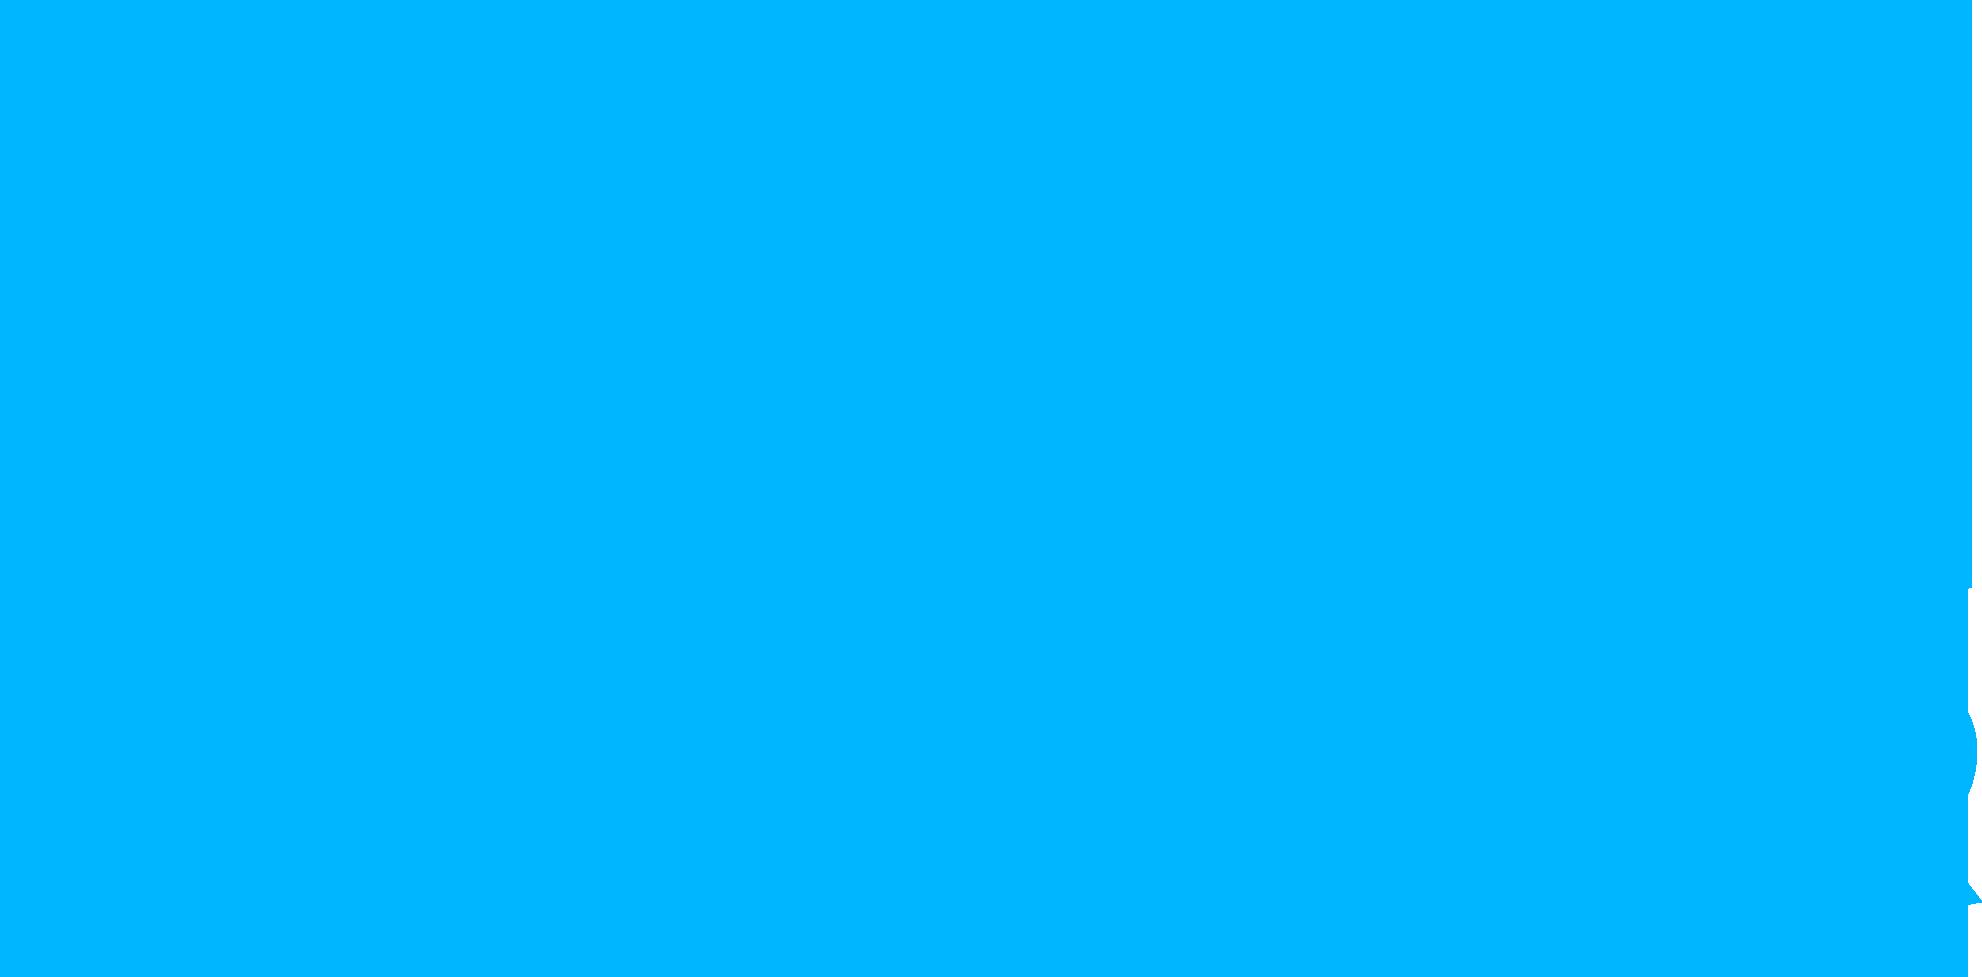 arvi_vr_blue